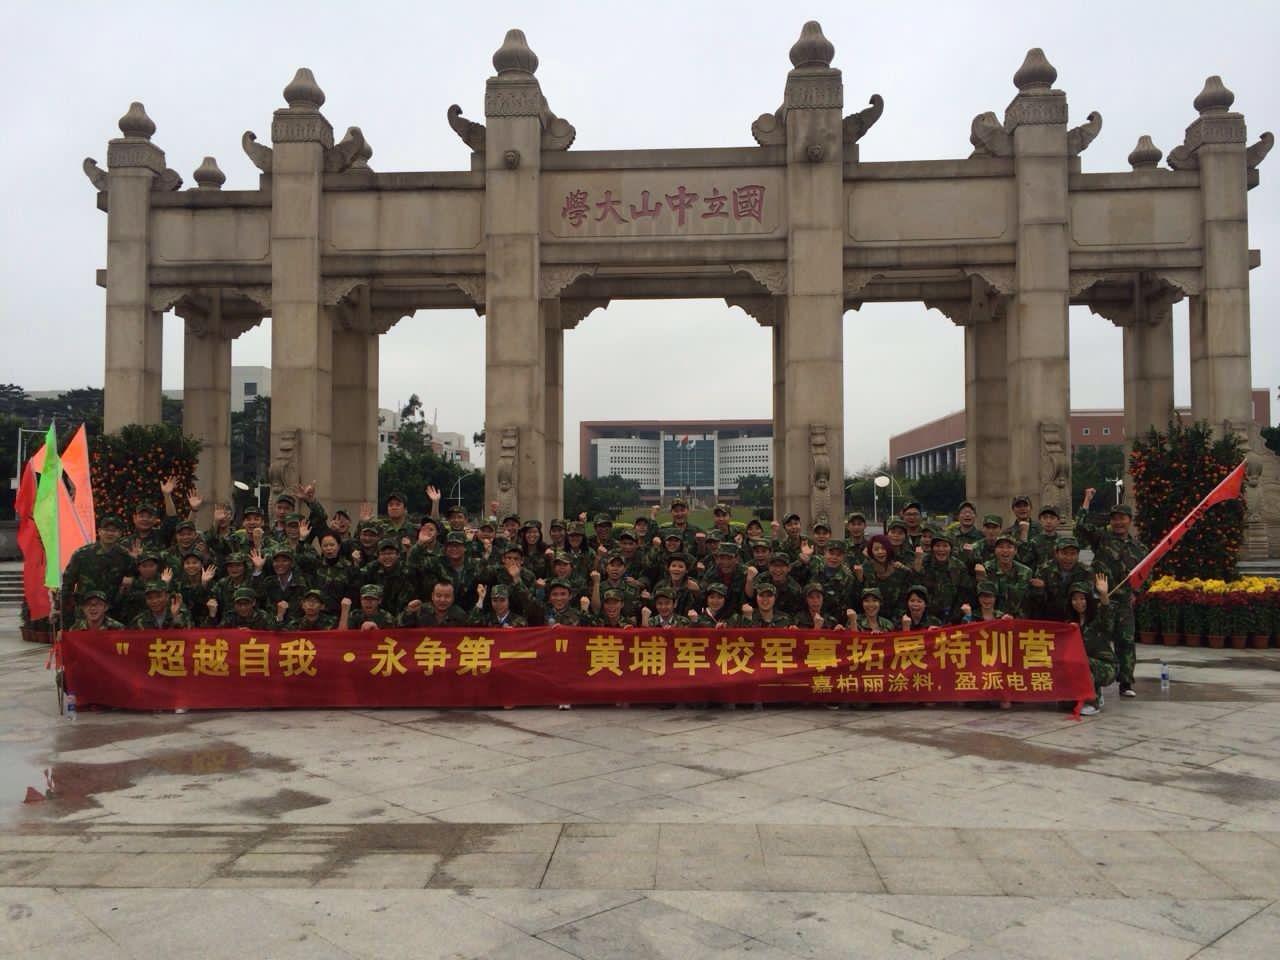 news-Ying Jia Baili, Ying Ying to join the Whampoa Military Academy of military training-WINPAI-img